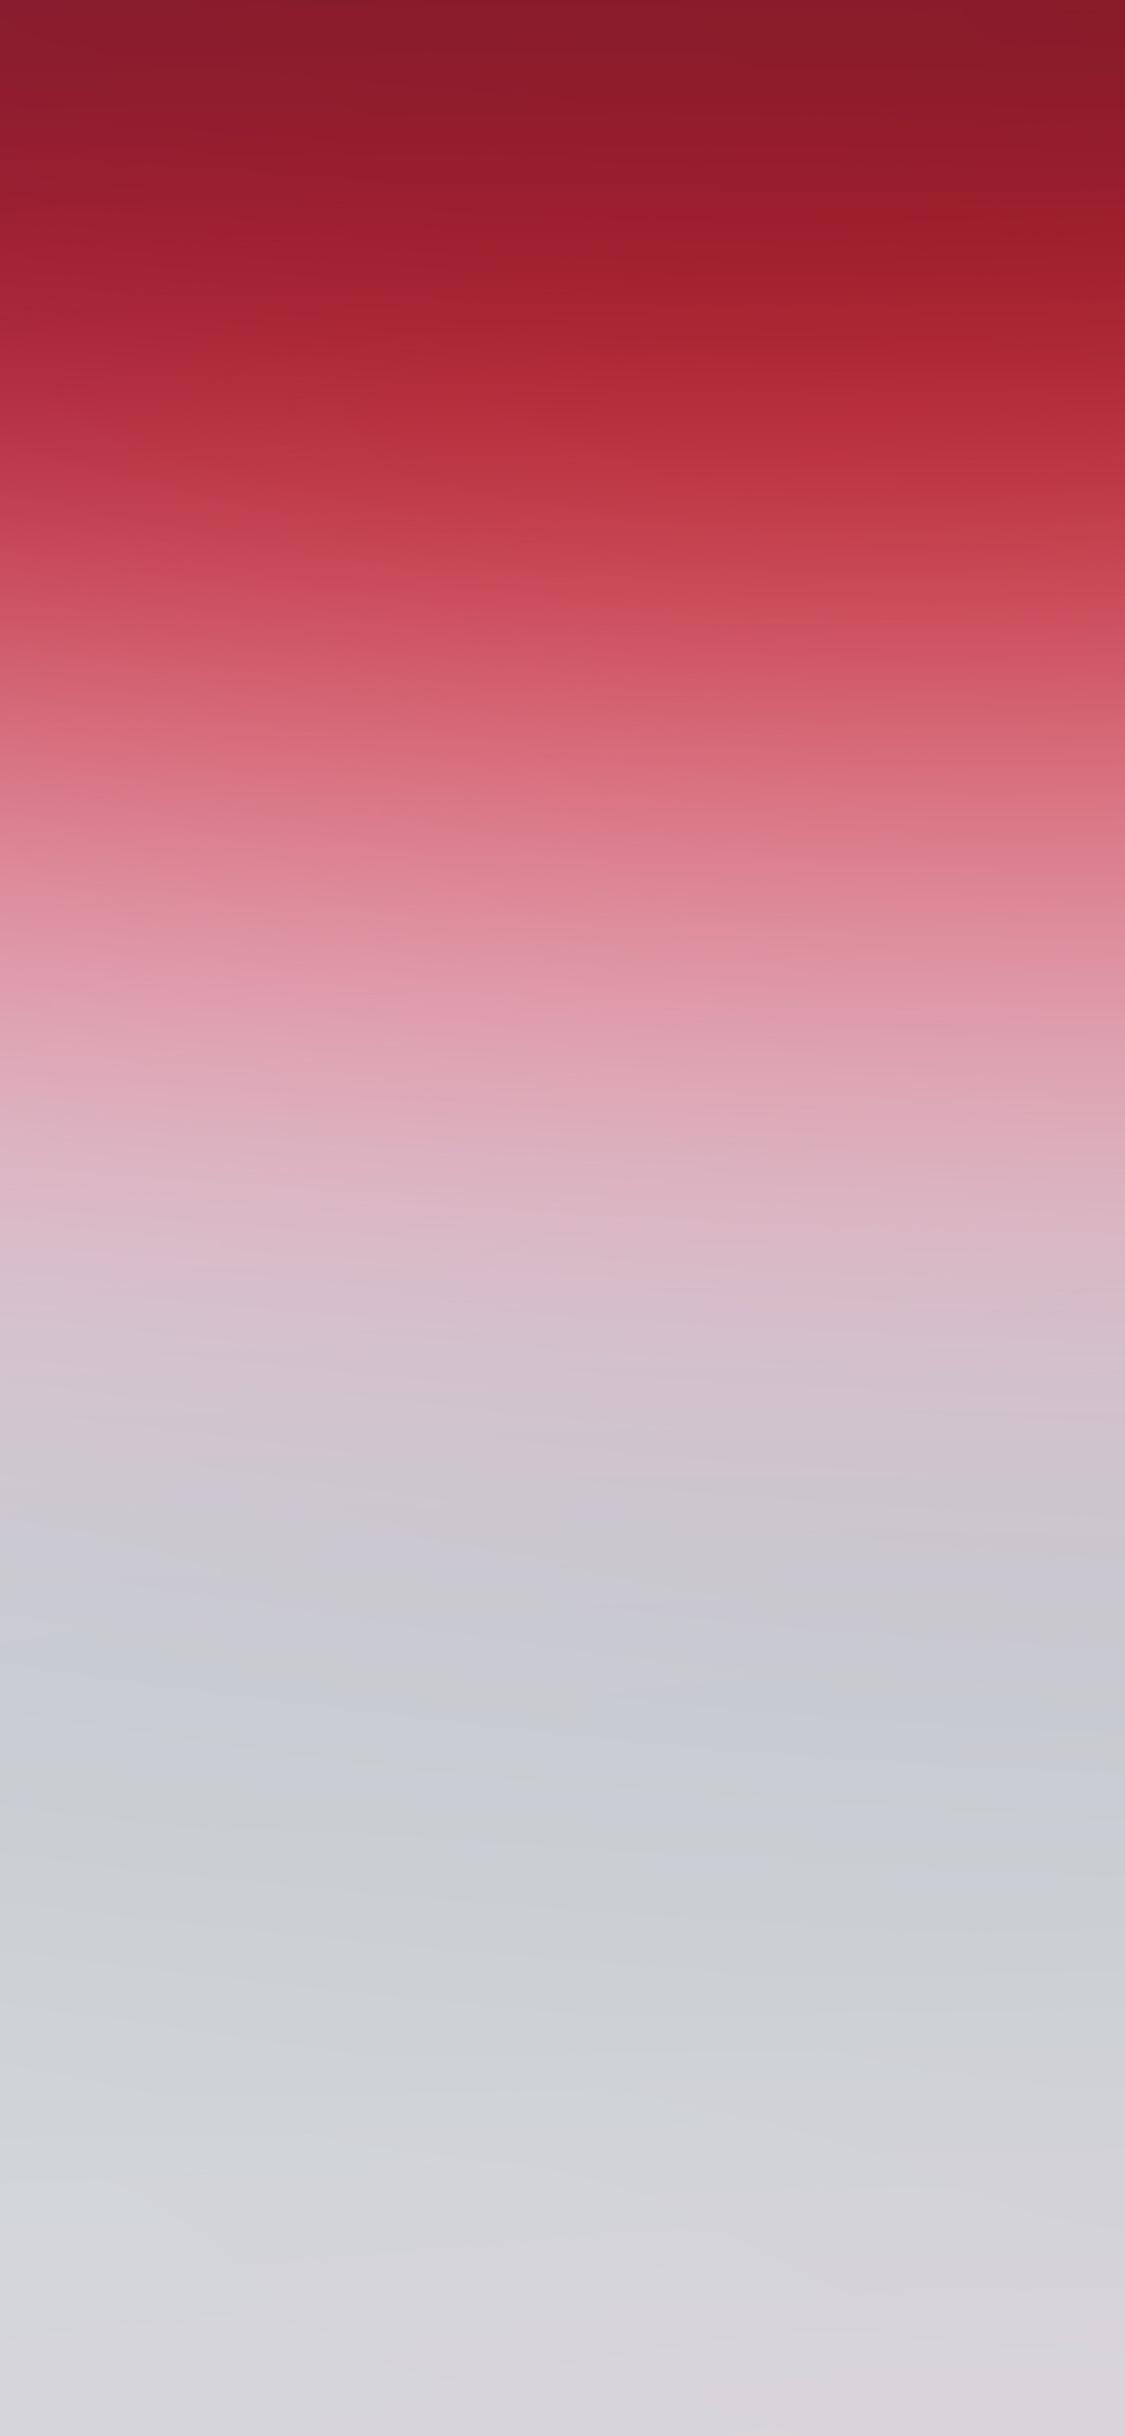 iPhoneXpapers.com-Apple-iPhone-wallpaper-sj59-red-blood-gradation-blur